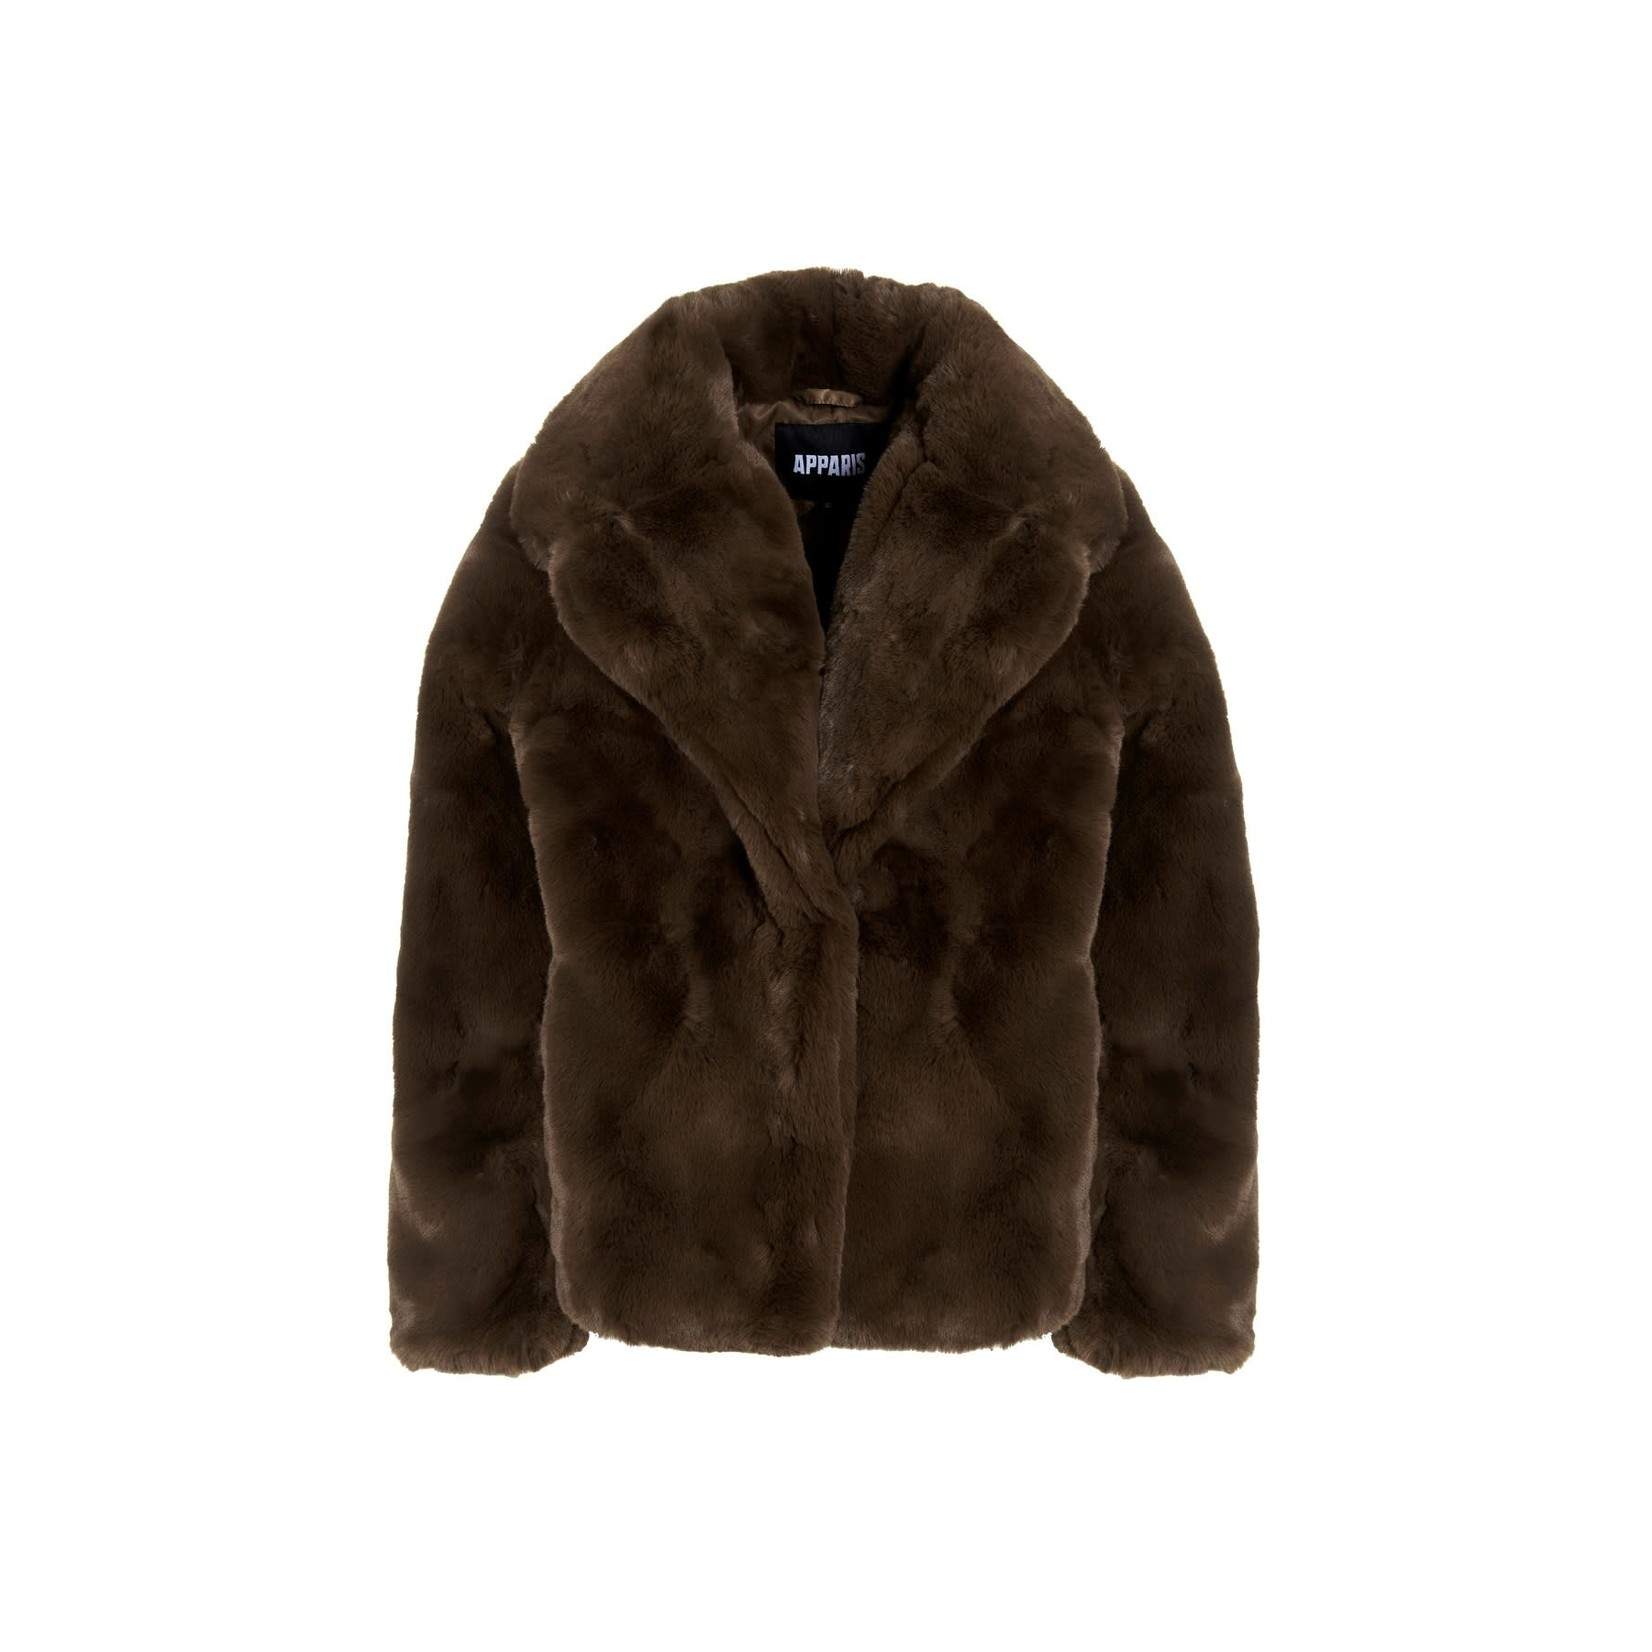 Apparis Milly Jacket